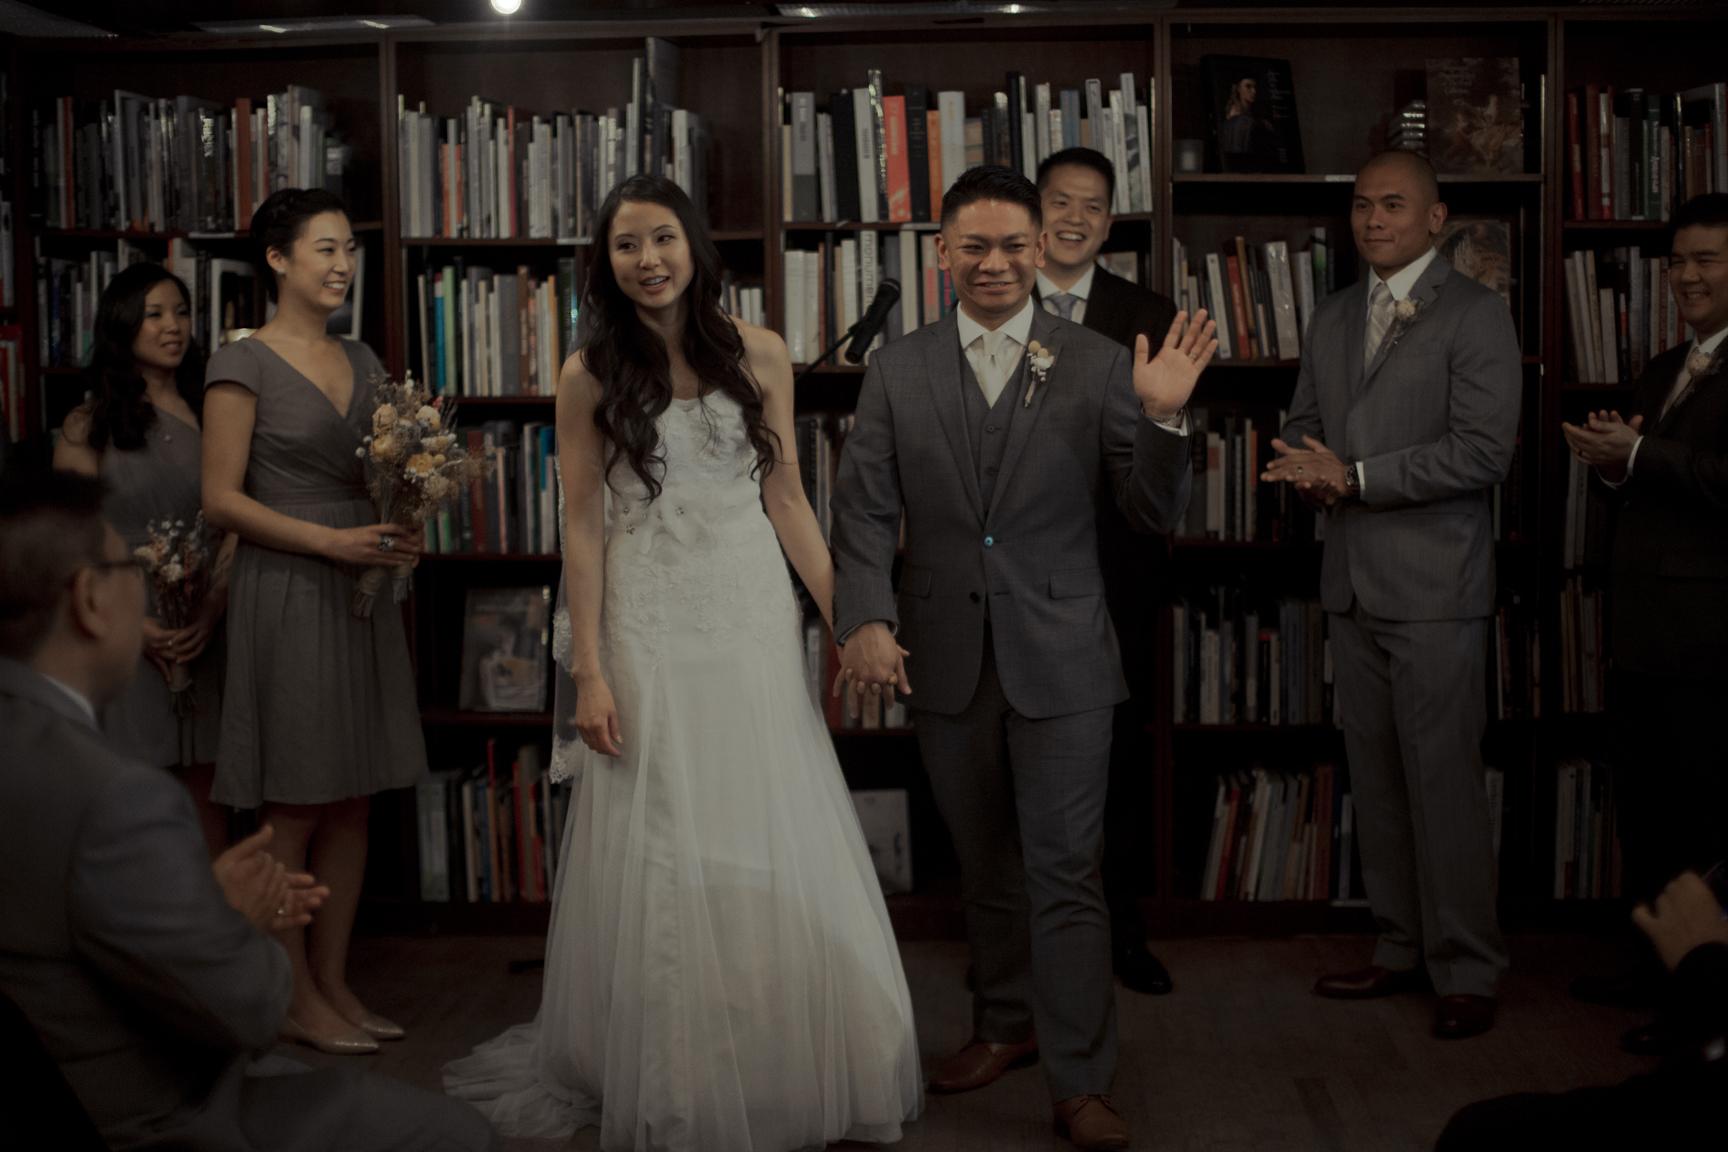 New-York-City-Wedding-Photographer_068